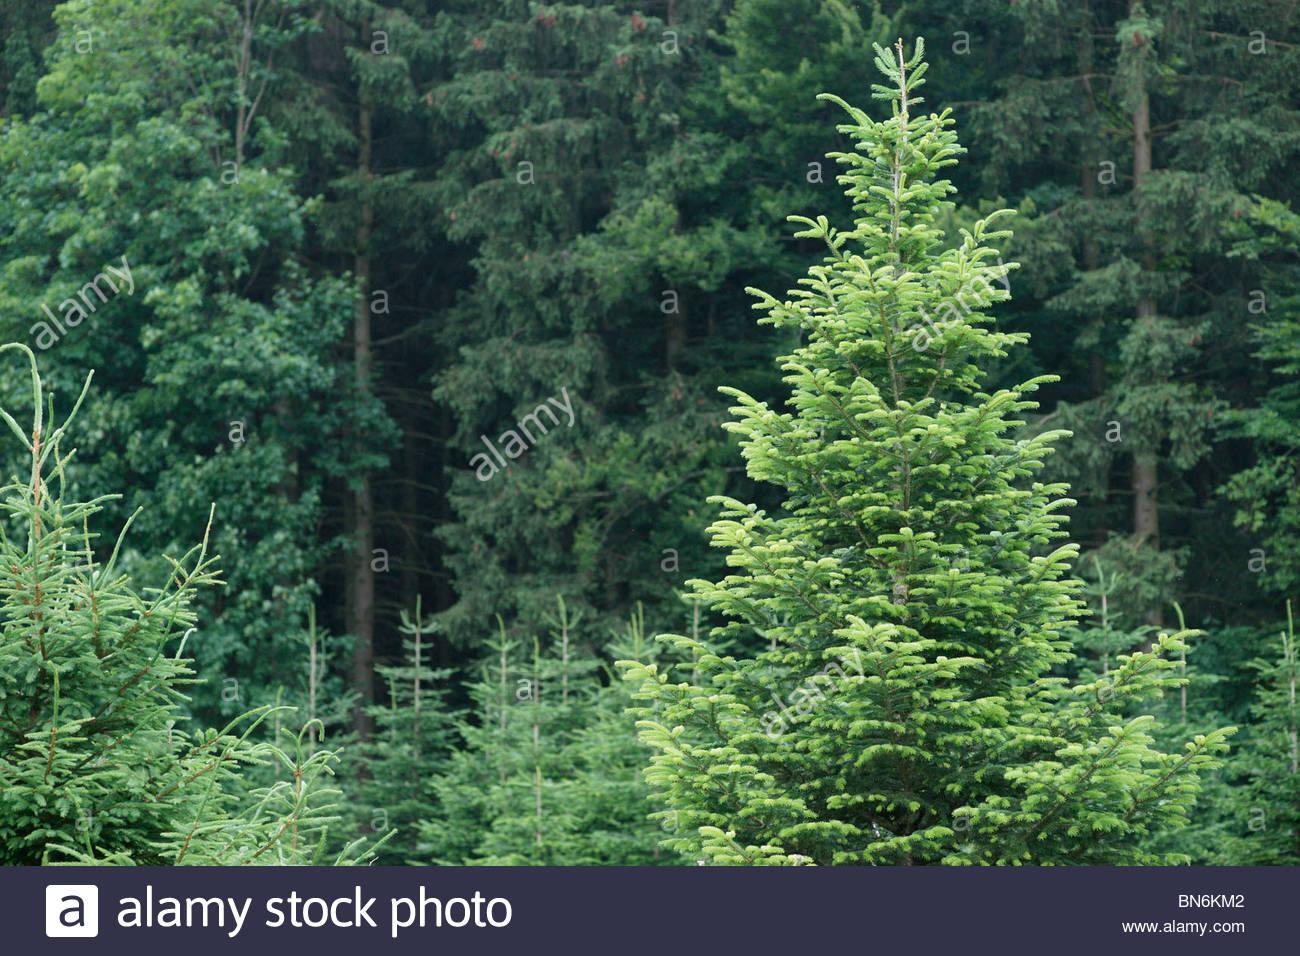 Pine trees growing Bavaria Germany - Stock Image